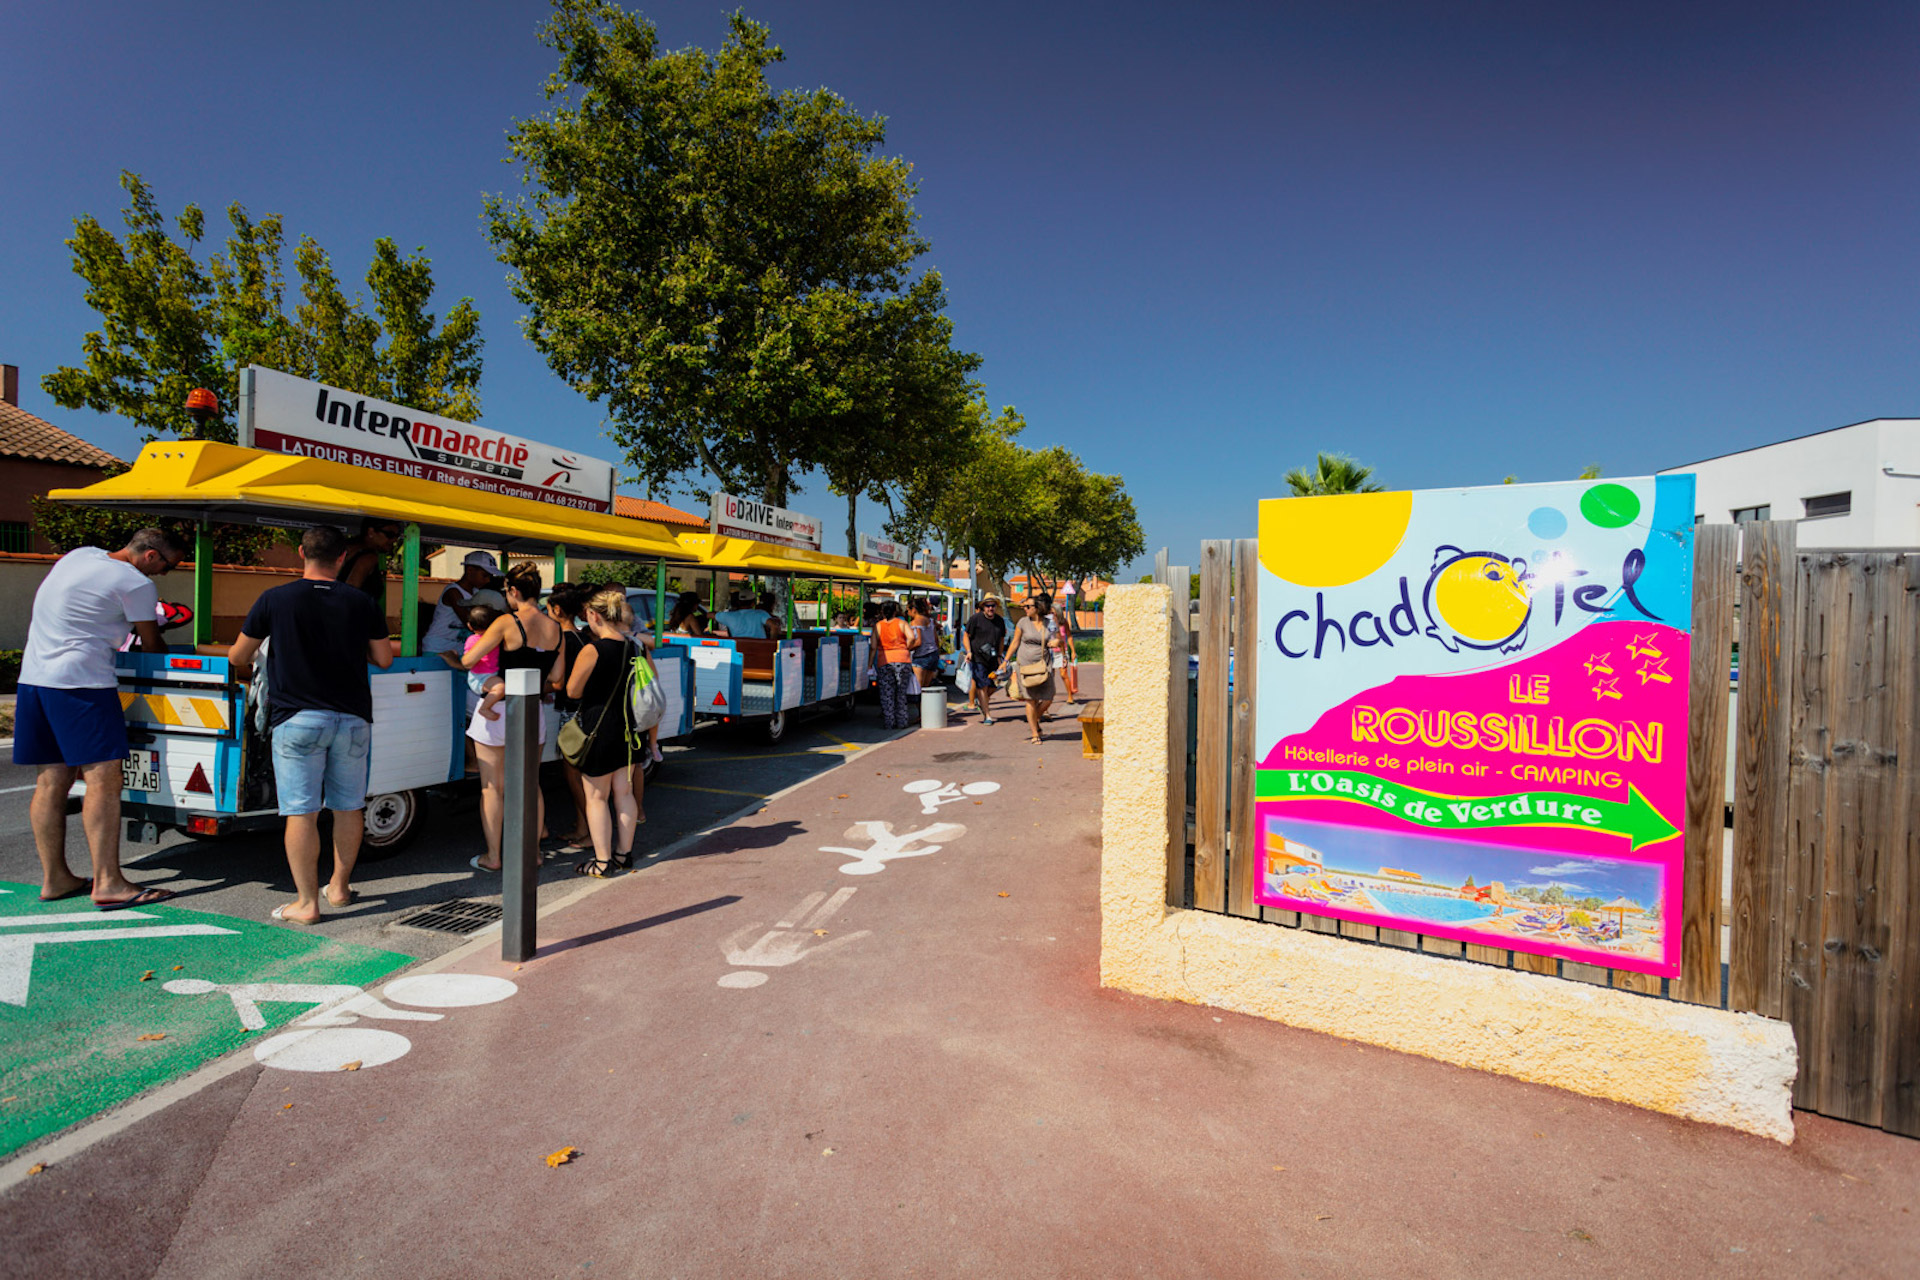 © camping chadotel le roussillon - saint cyprien